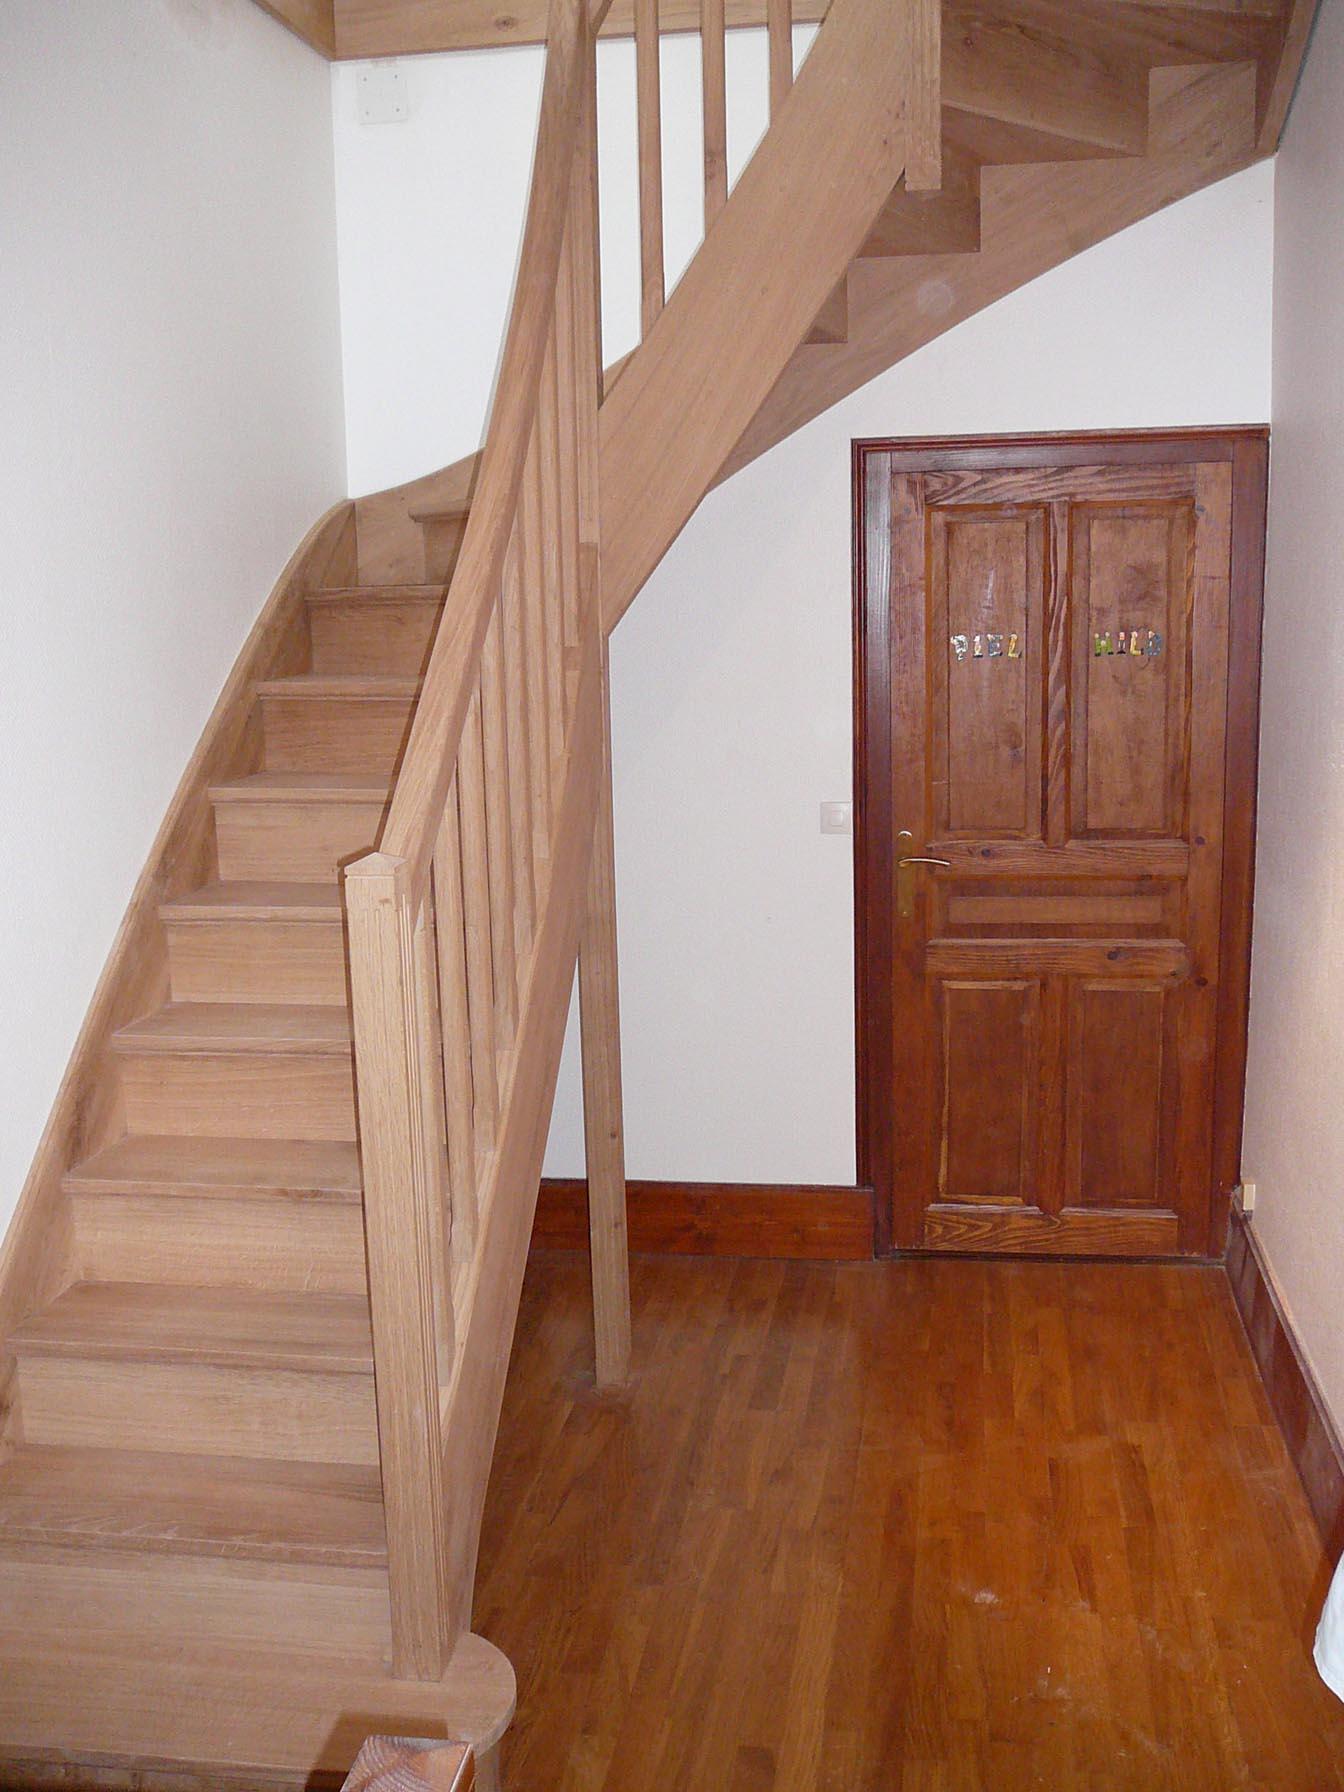 Ancey escalier en chêne double quart tournant